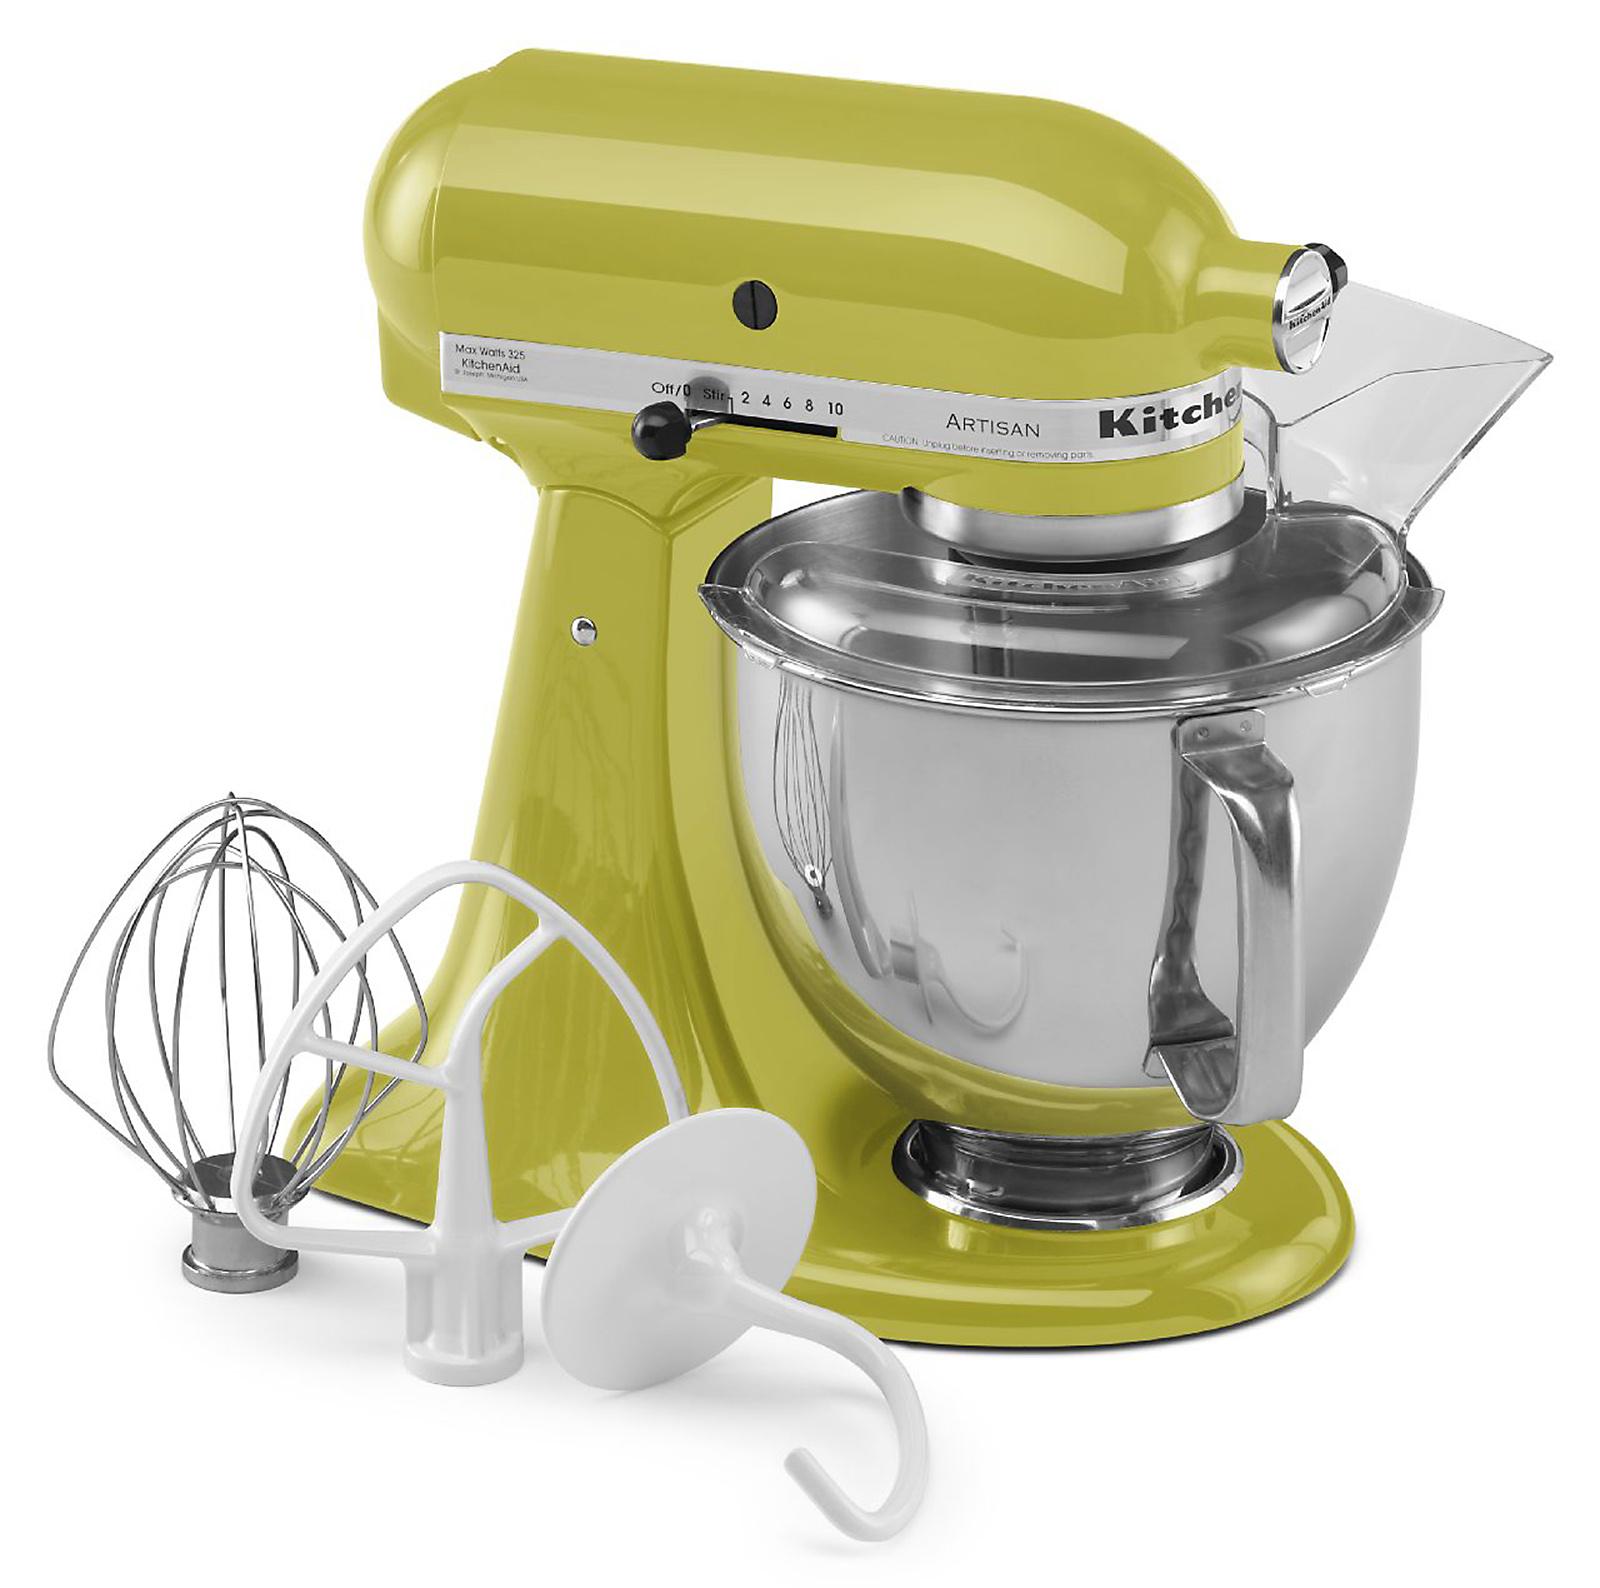 kitchenaid ksm150pspe artisan series pear 5 qt stand mixer rh searsoutlet com kitchenaid stand mixer troubleshooting manual KSM95ER KitchenAid Mixer Repair Manual PDF